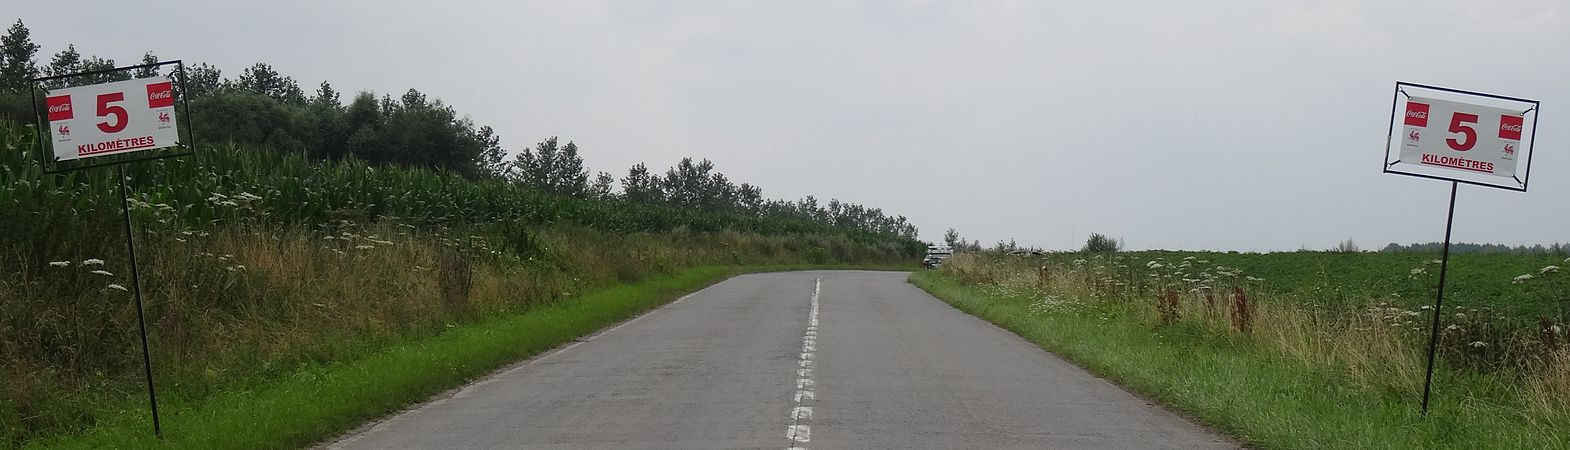 Rumillies (Tournai) - Tour de Wallonie, étape 1, 26 juillet 2014, ravitaillement (A08).JPG